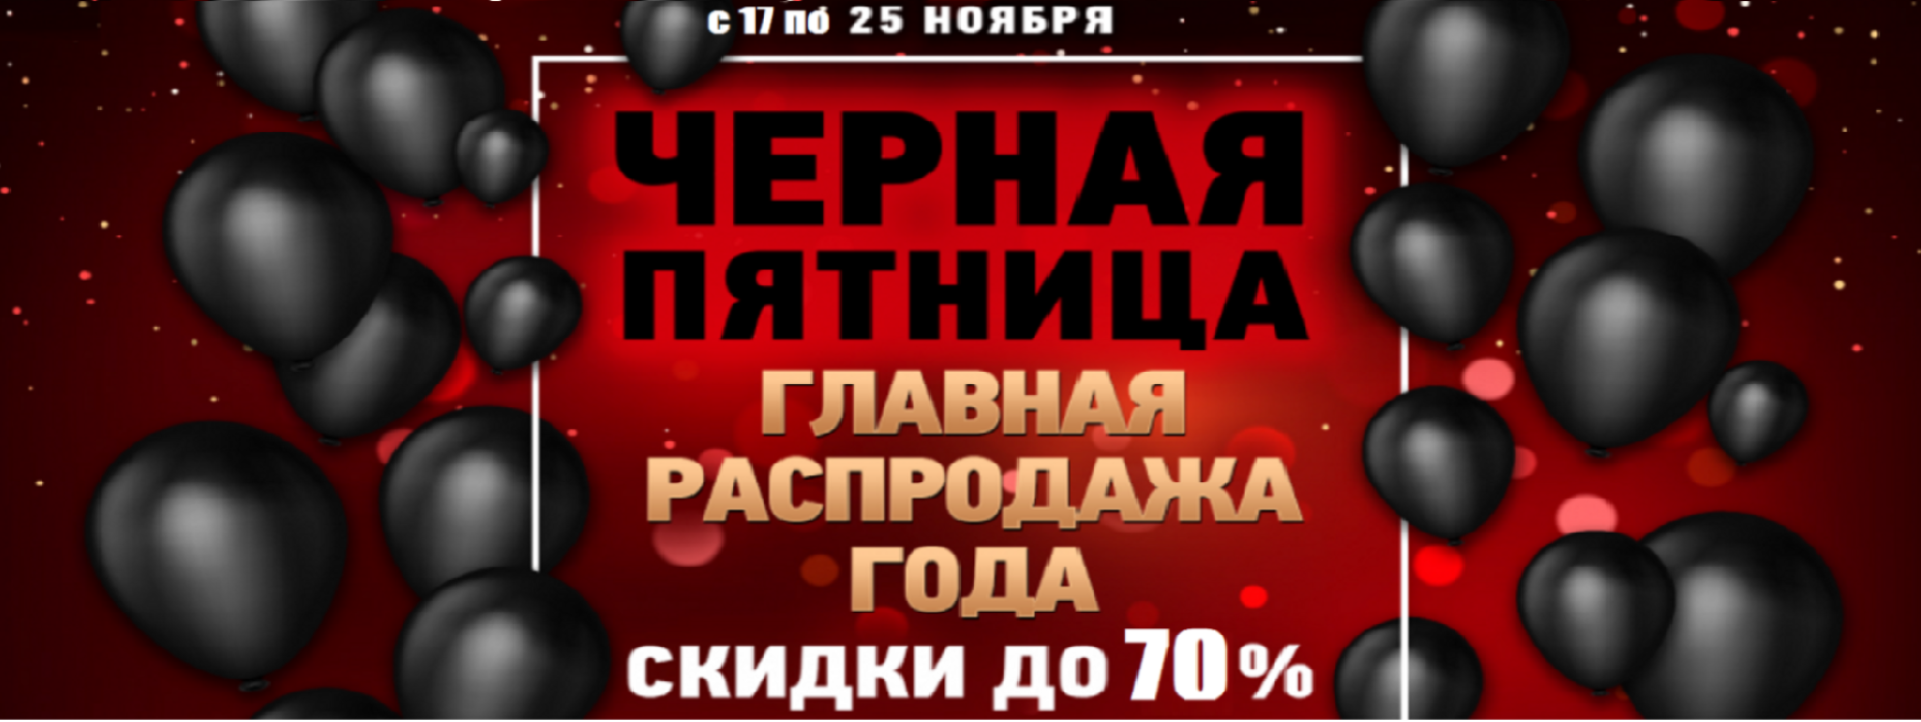 chjornaya_pyatnica_sandal.zp.ua__1_